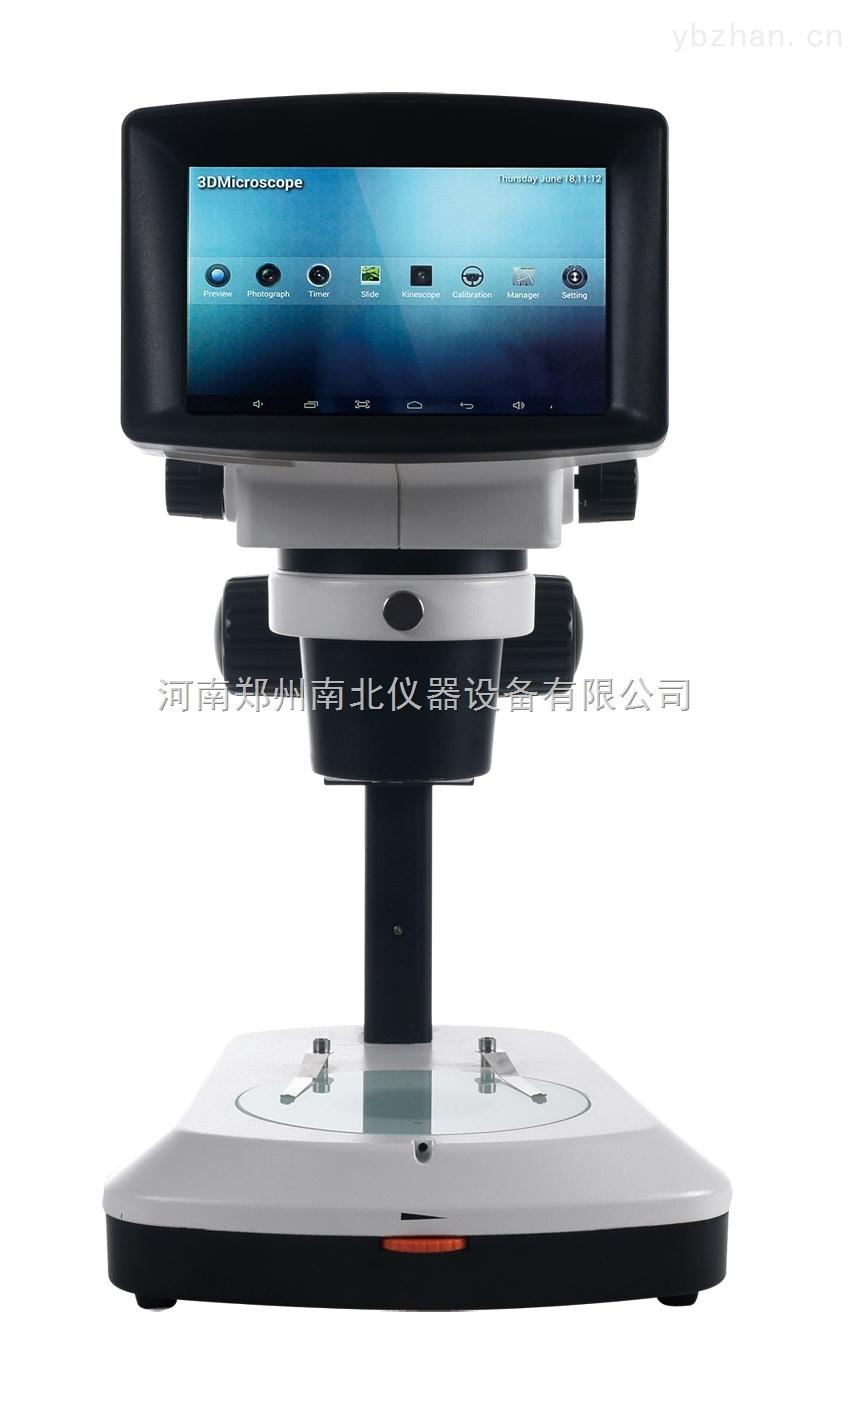 3D光學顯微鏡報價,3D光學顯微鏡價格